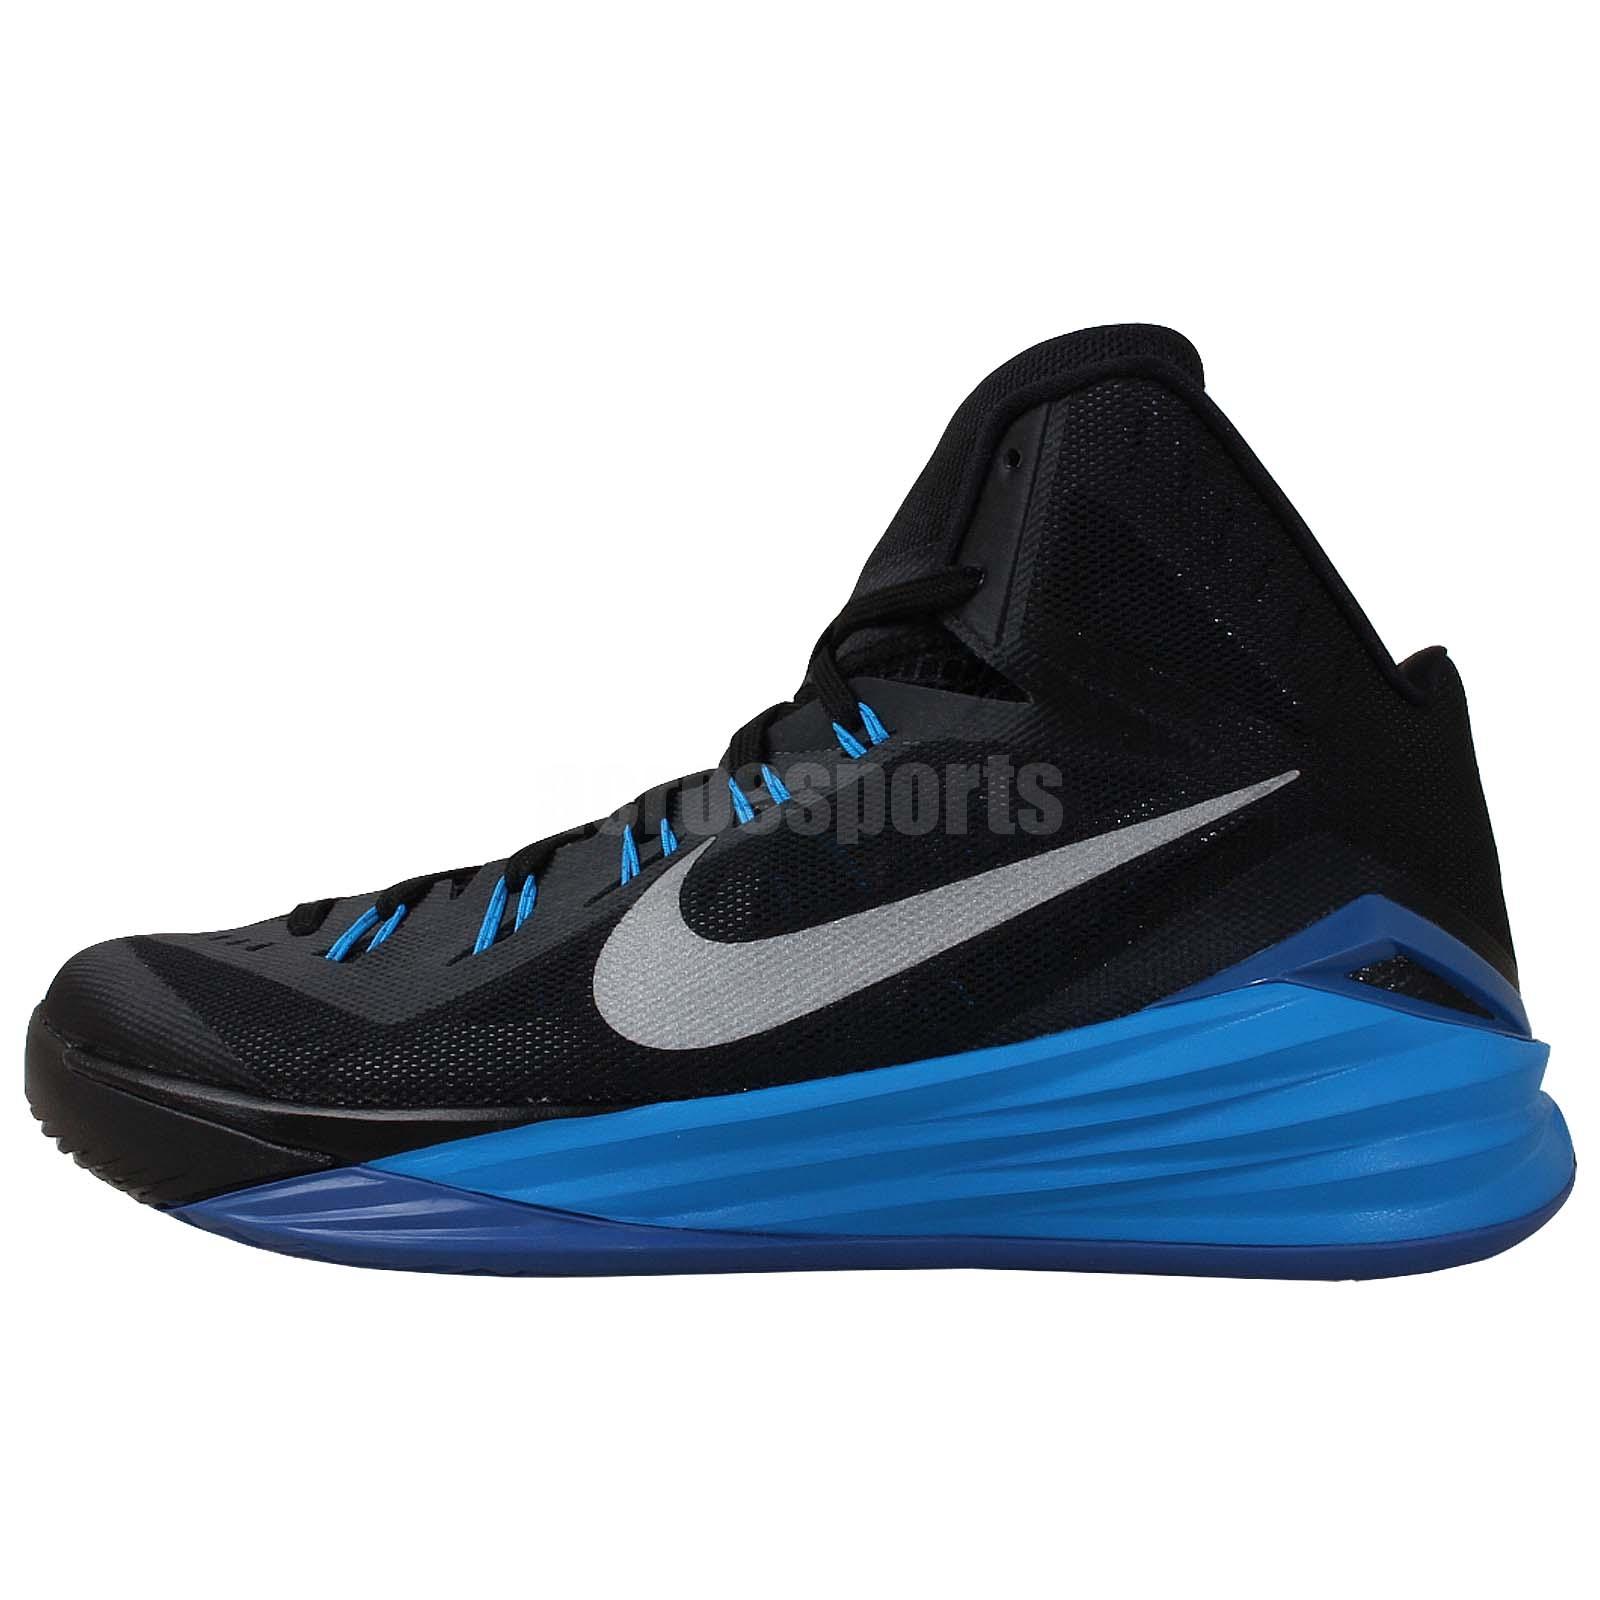 Nike Hyperdunk 2014 PE Paul George Blue Yellow Pacers ... |Paul George Shoes Hyperdunk 2014